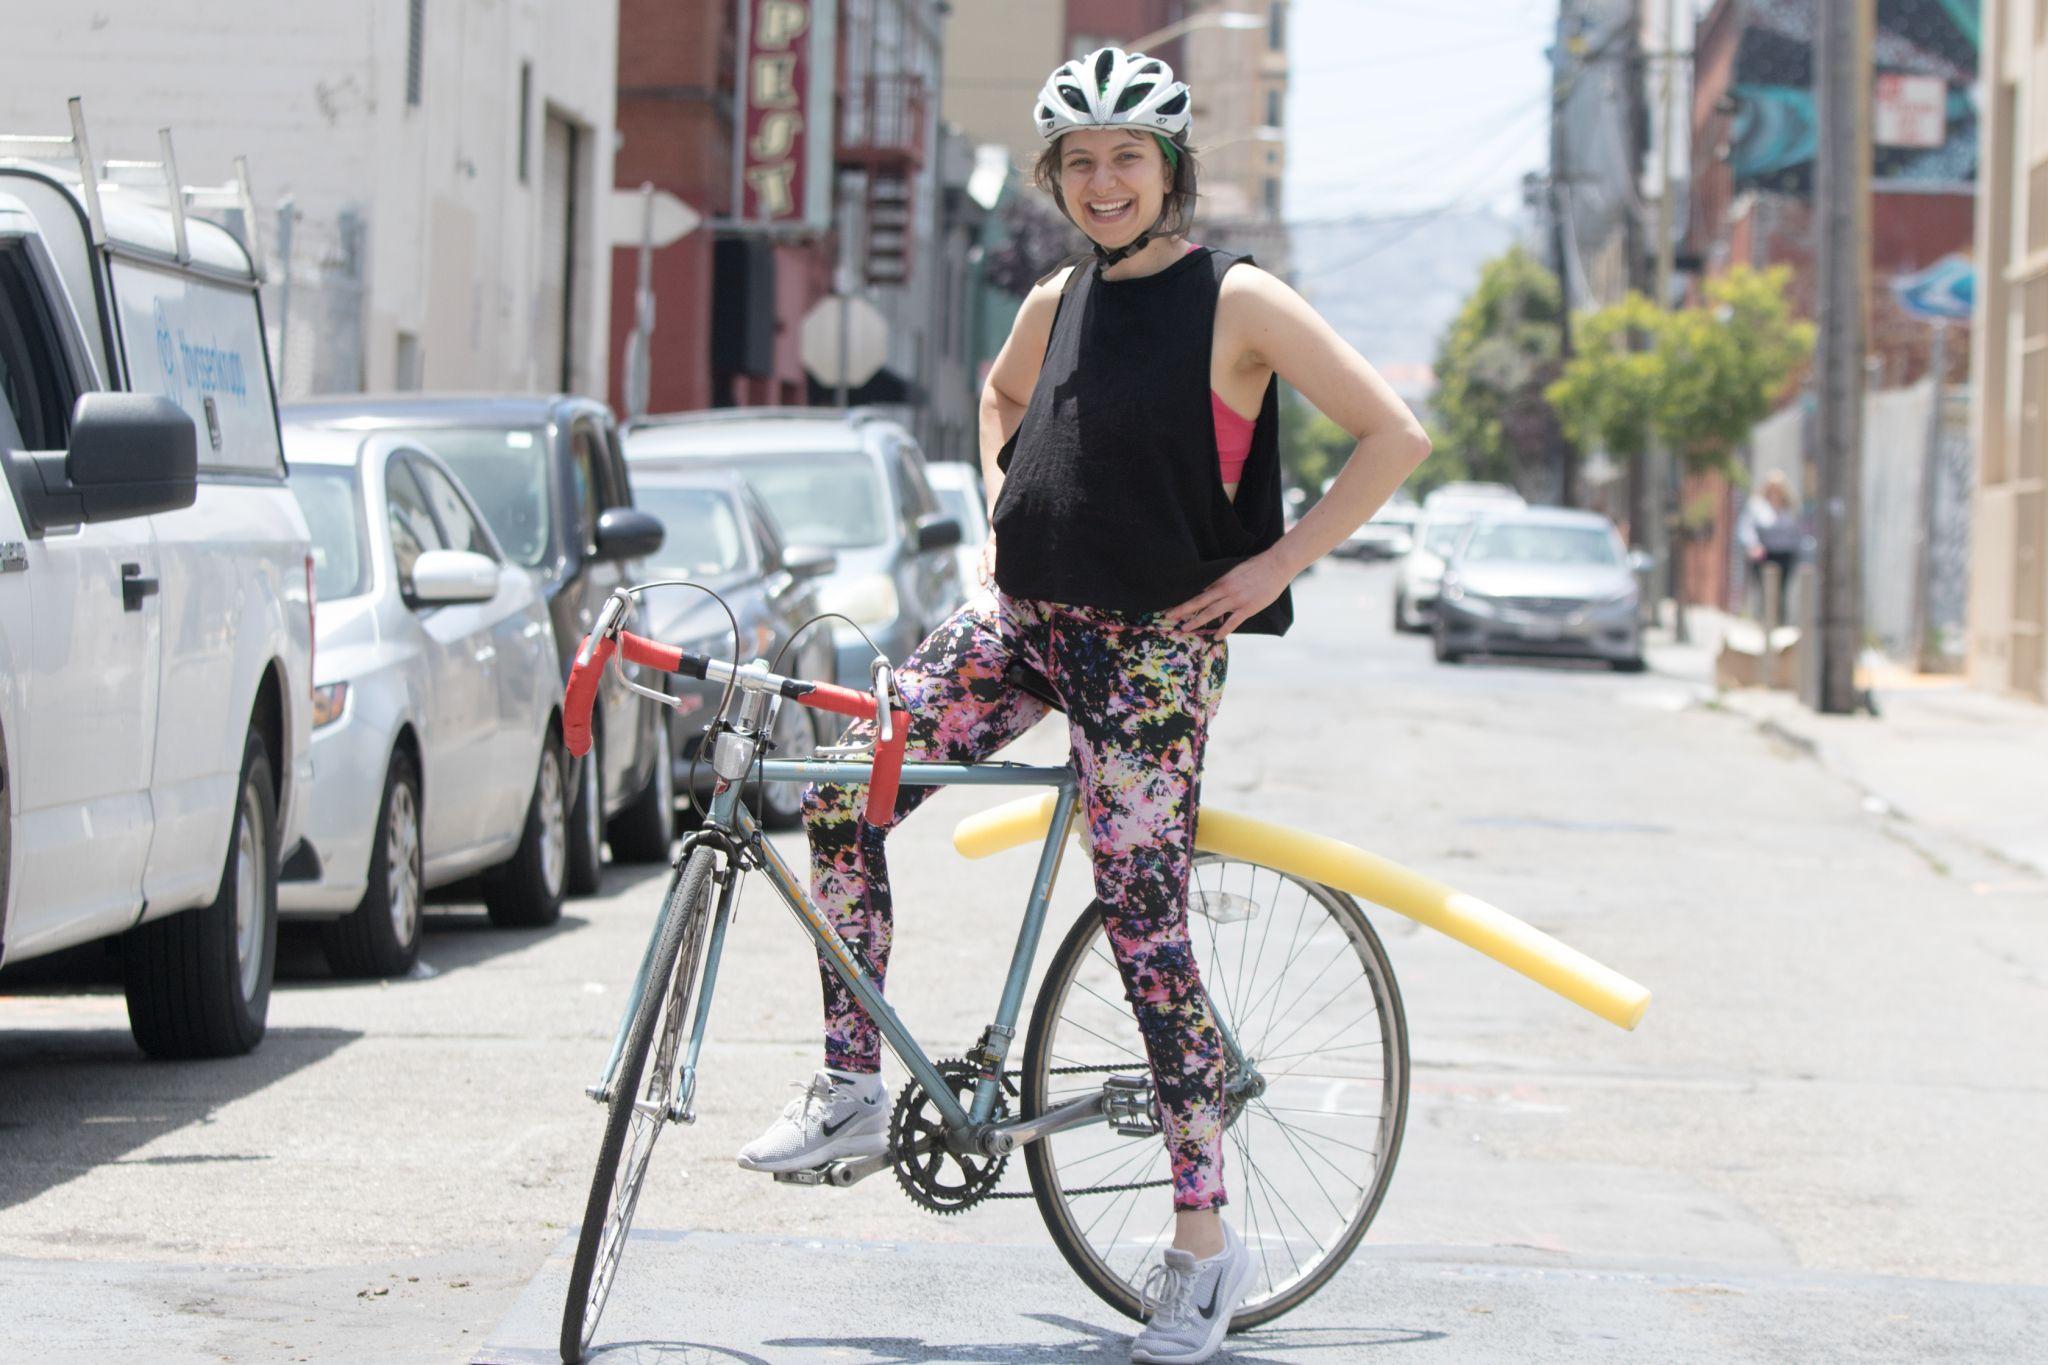 I'm SFGATE's 'Bay Area exodus' reporter. Now I'm leaving myself.